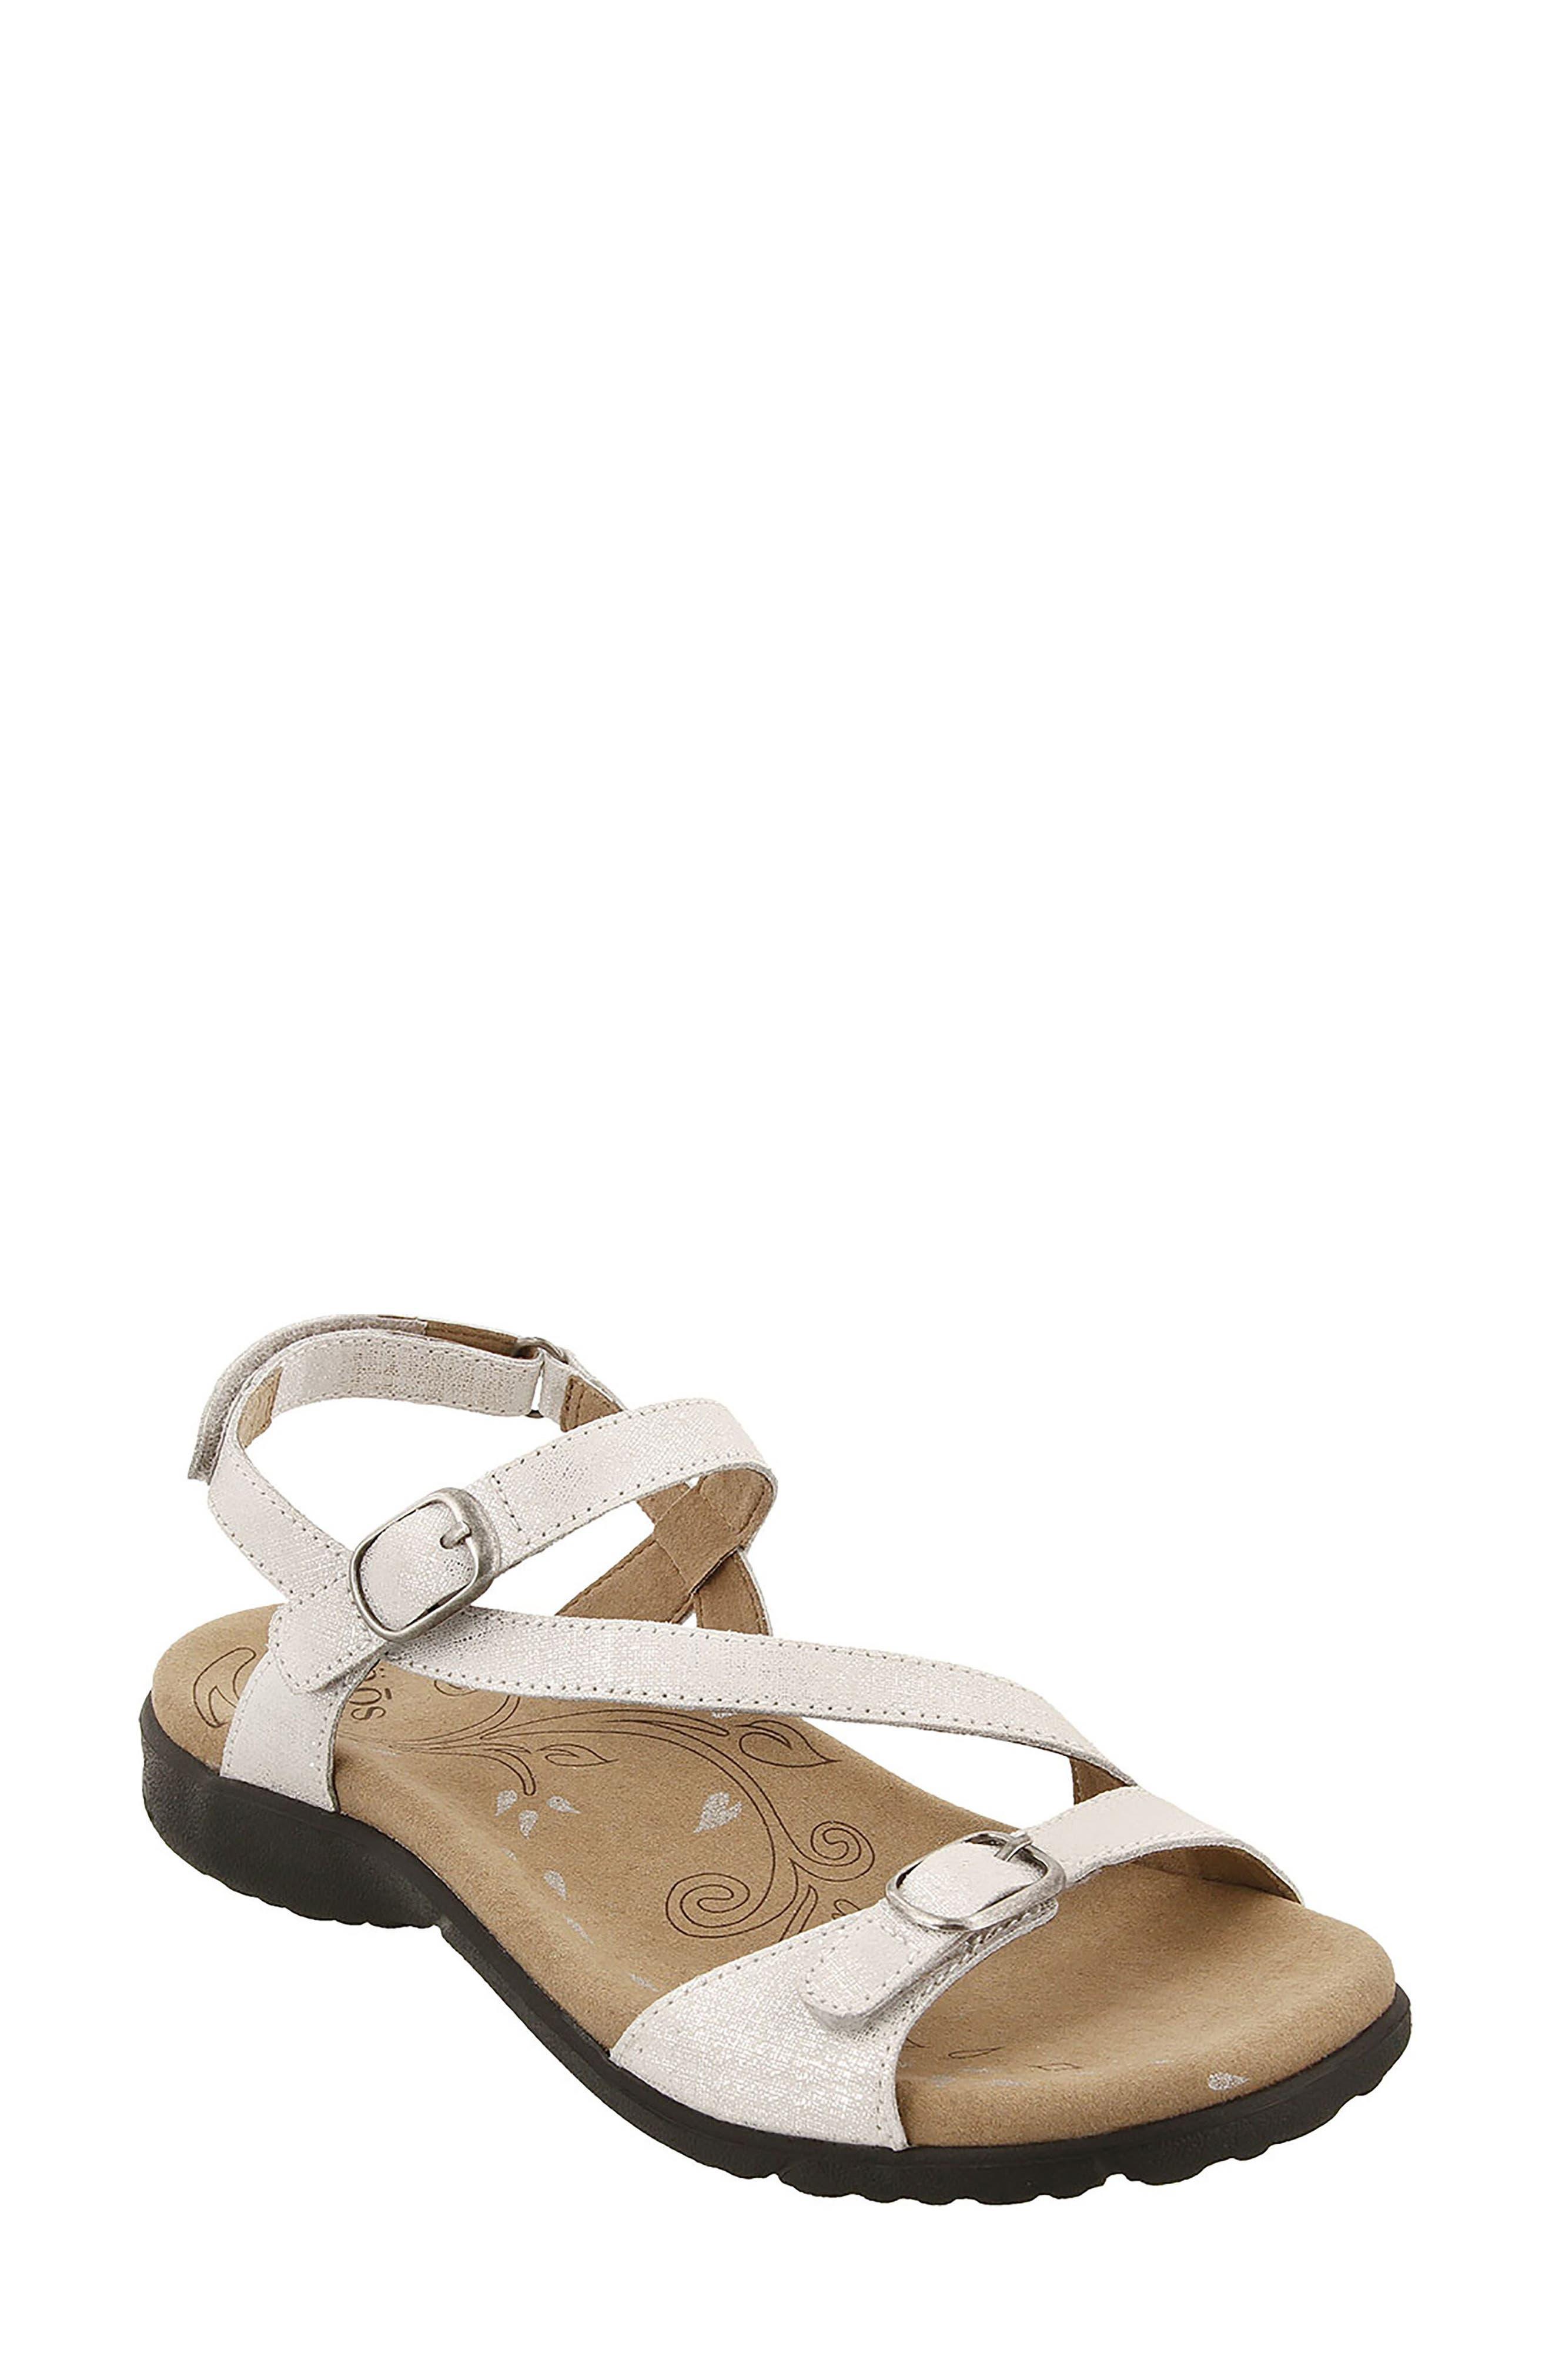 Beauty Sandal,                         Main,                         color, White Metallic Leather